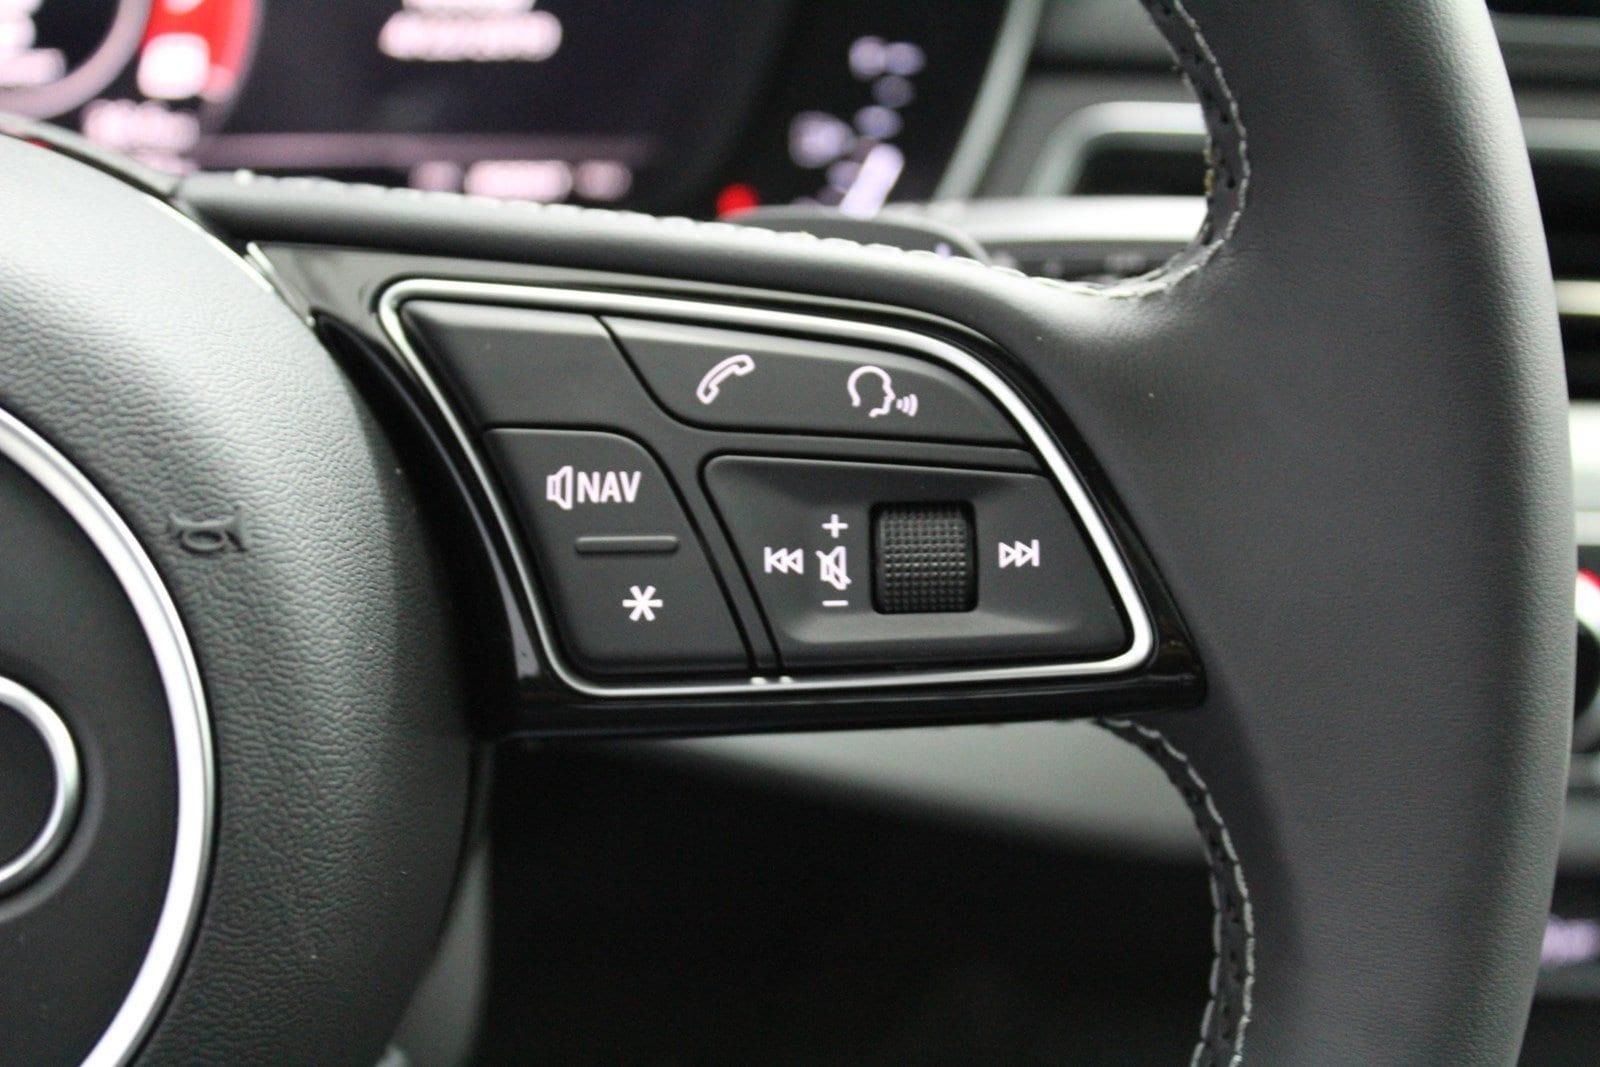 New 2019 Audi S4 For Sale in Houston TX | VIN: WAUB4AF40KA033894